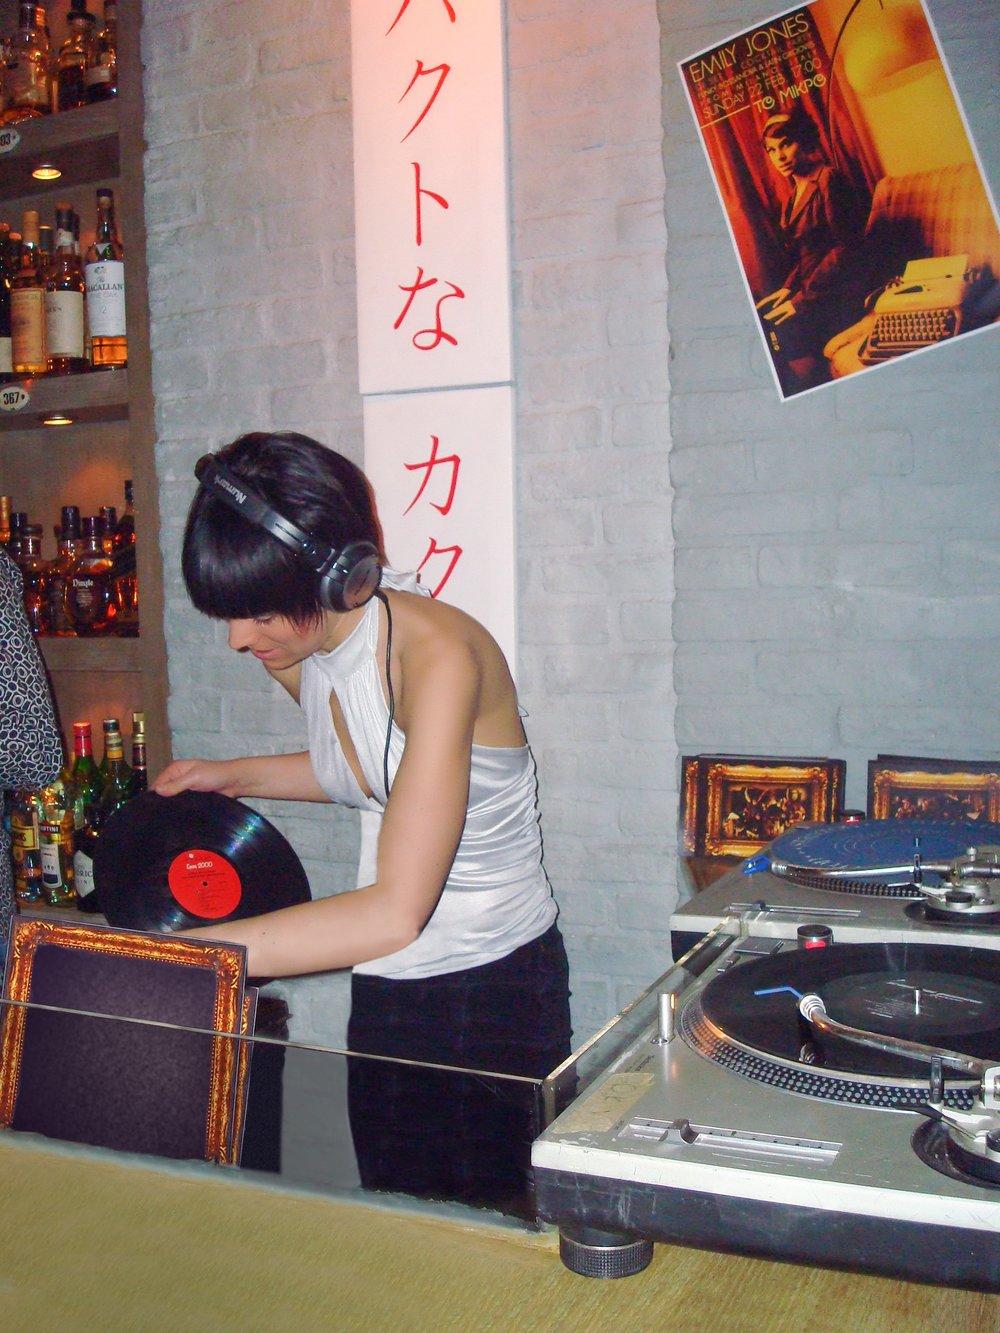 Diatiriteo Bar, Thessaloniki, Greece